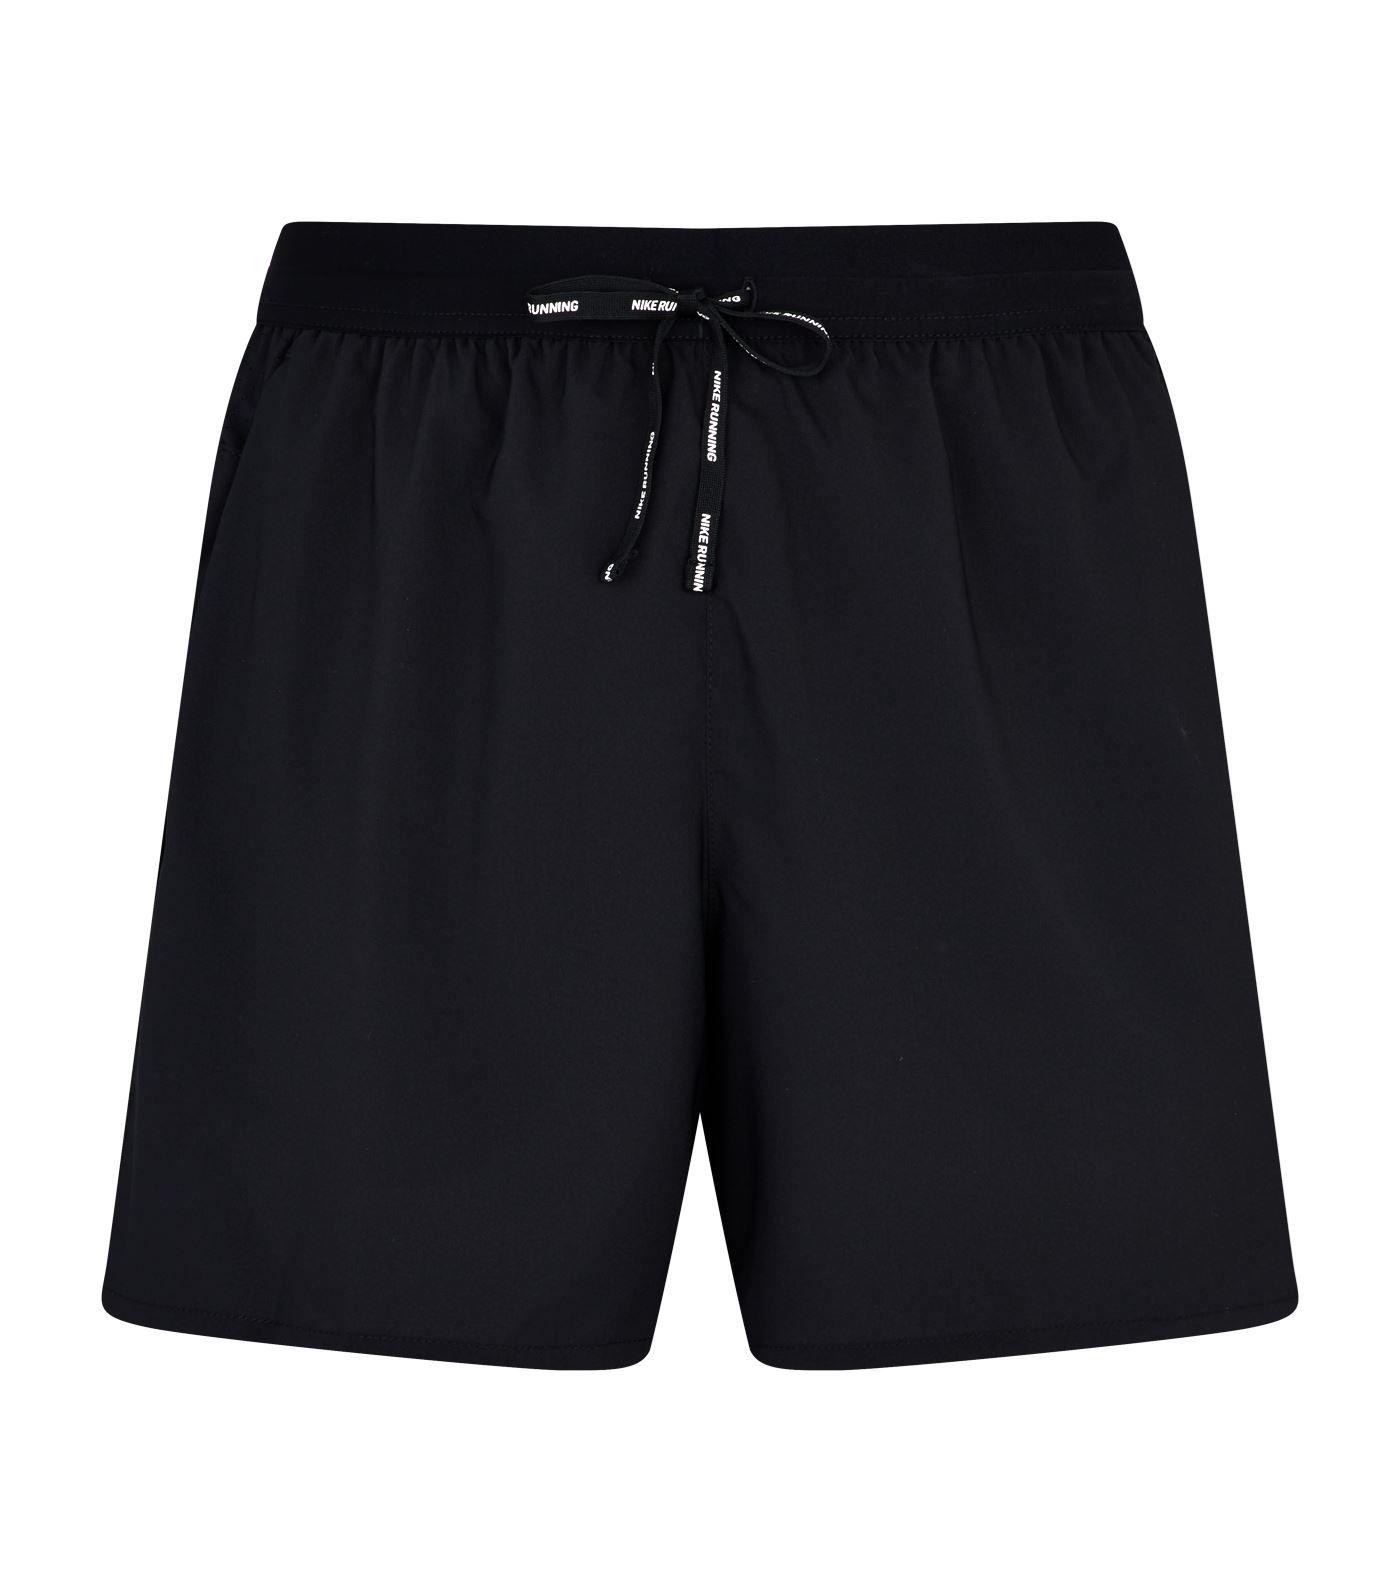 Drifit running shorts in black running shorts men